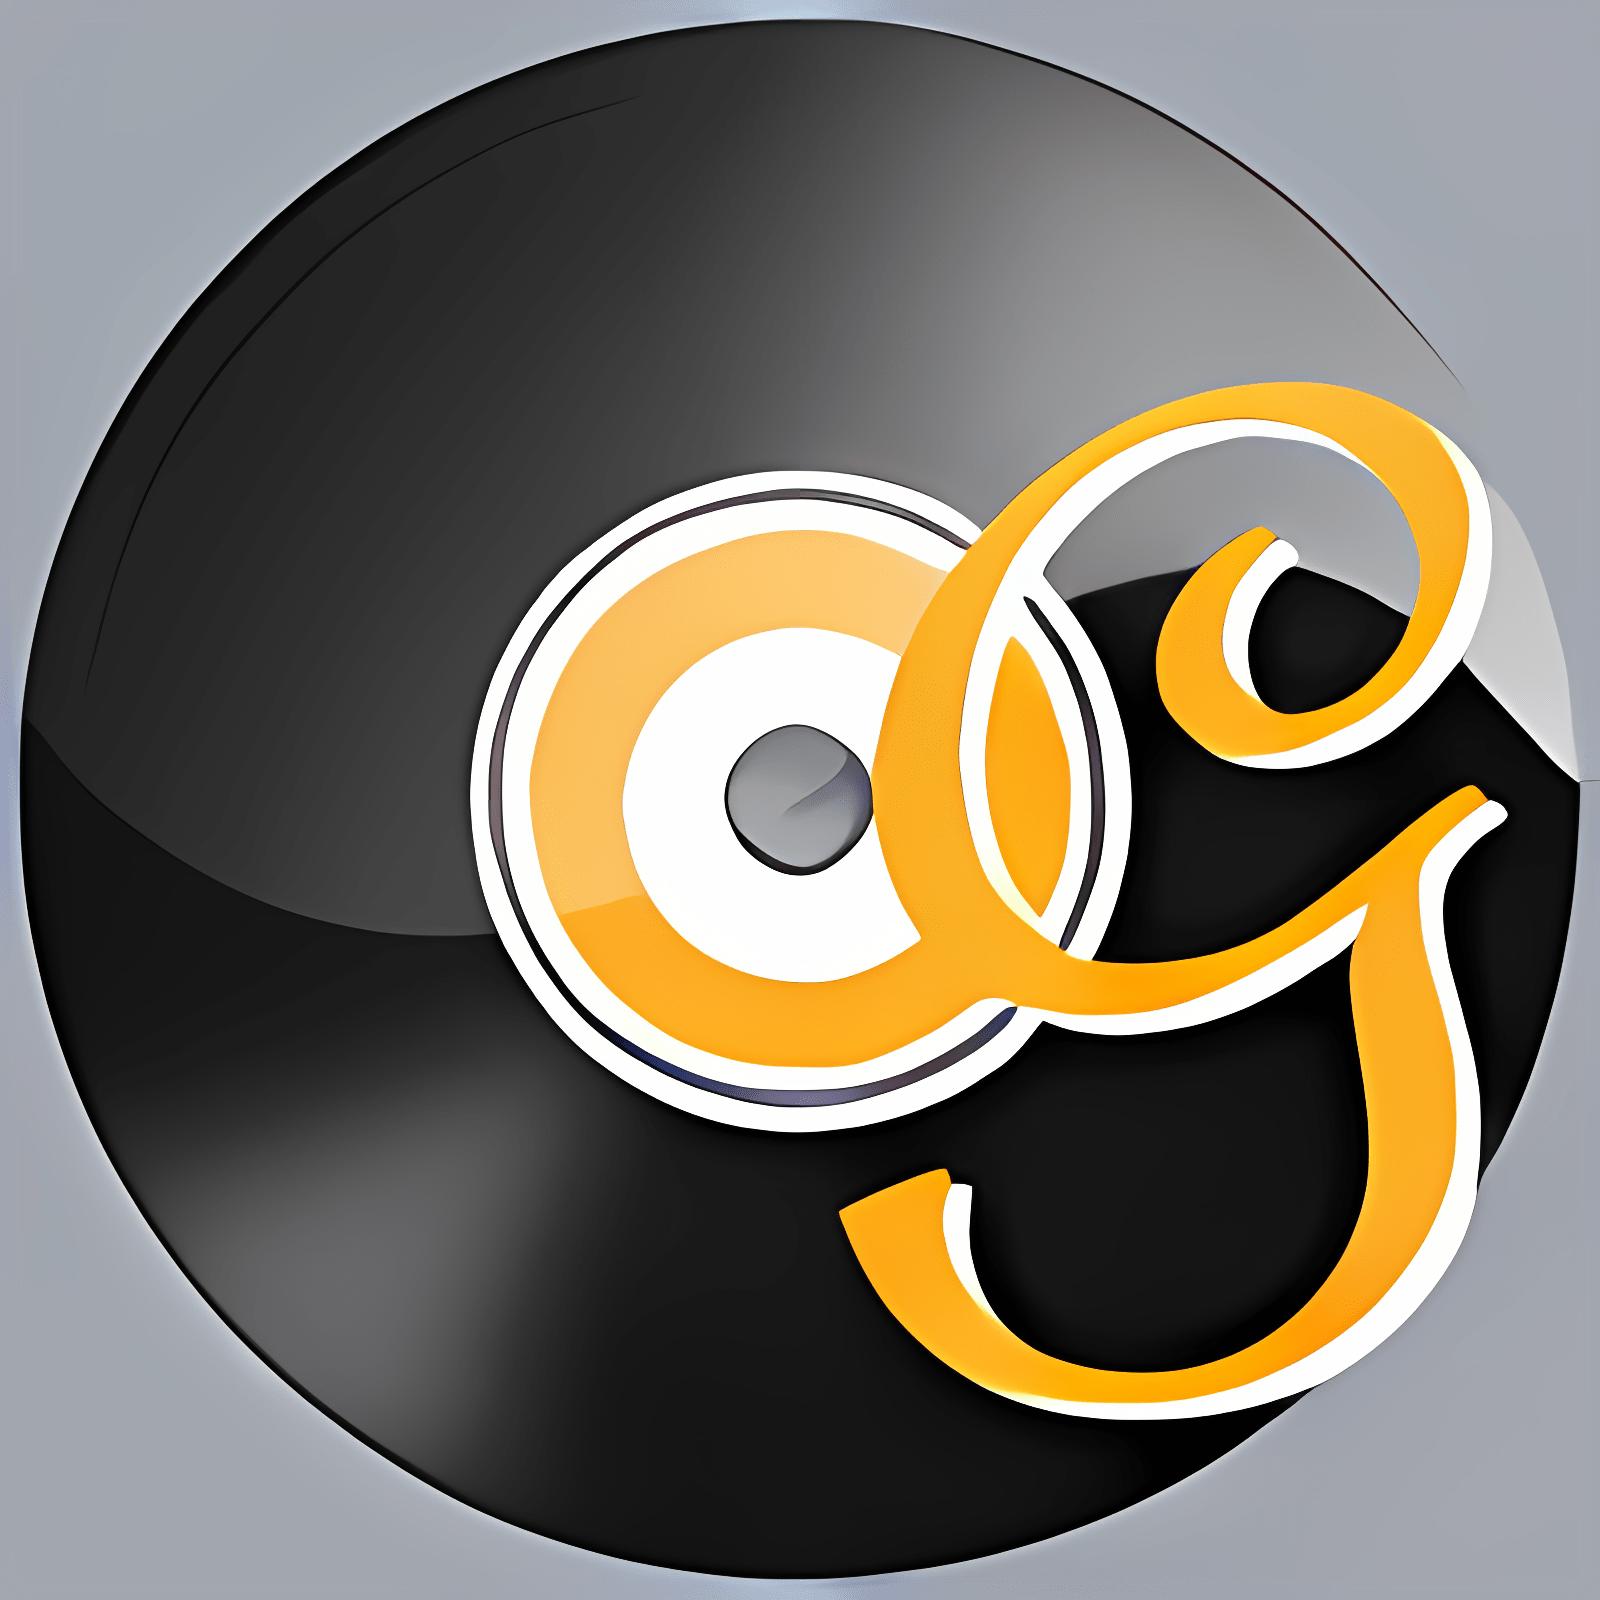 Golden Records Vinyl to CD Converter